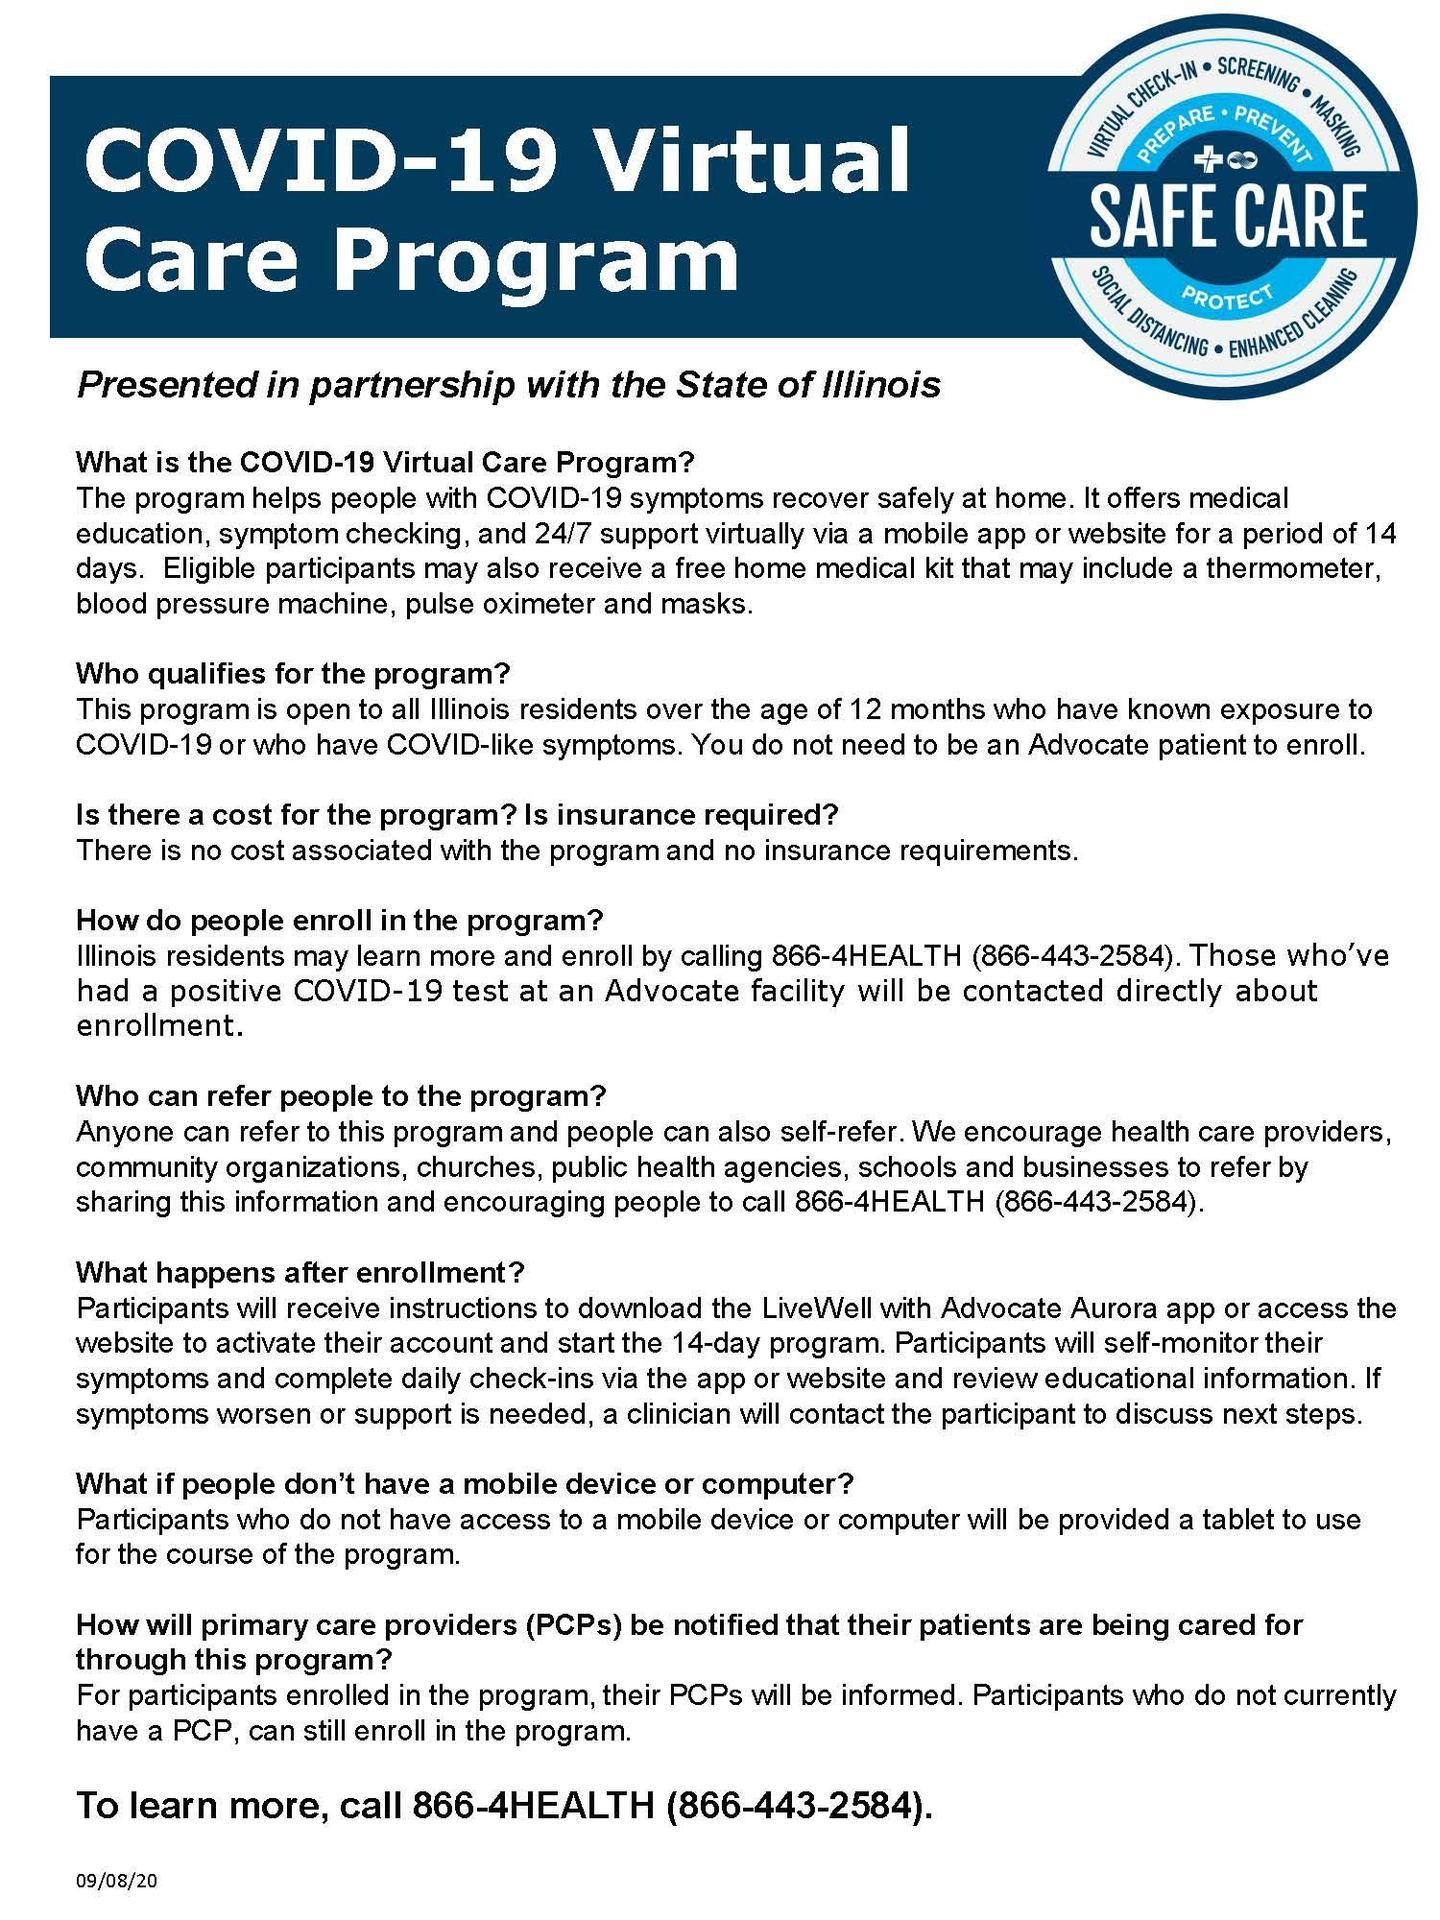 COVID 19 Virtual Care Program FAQs